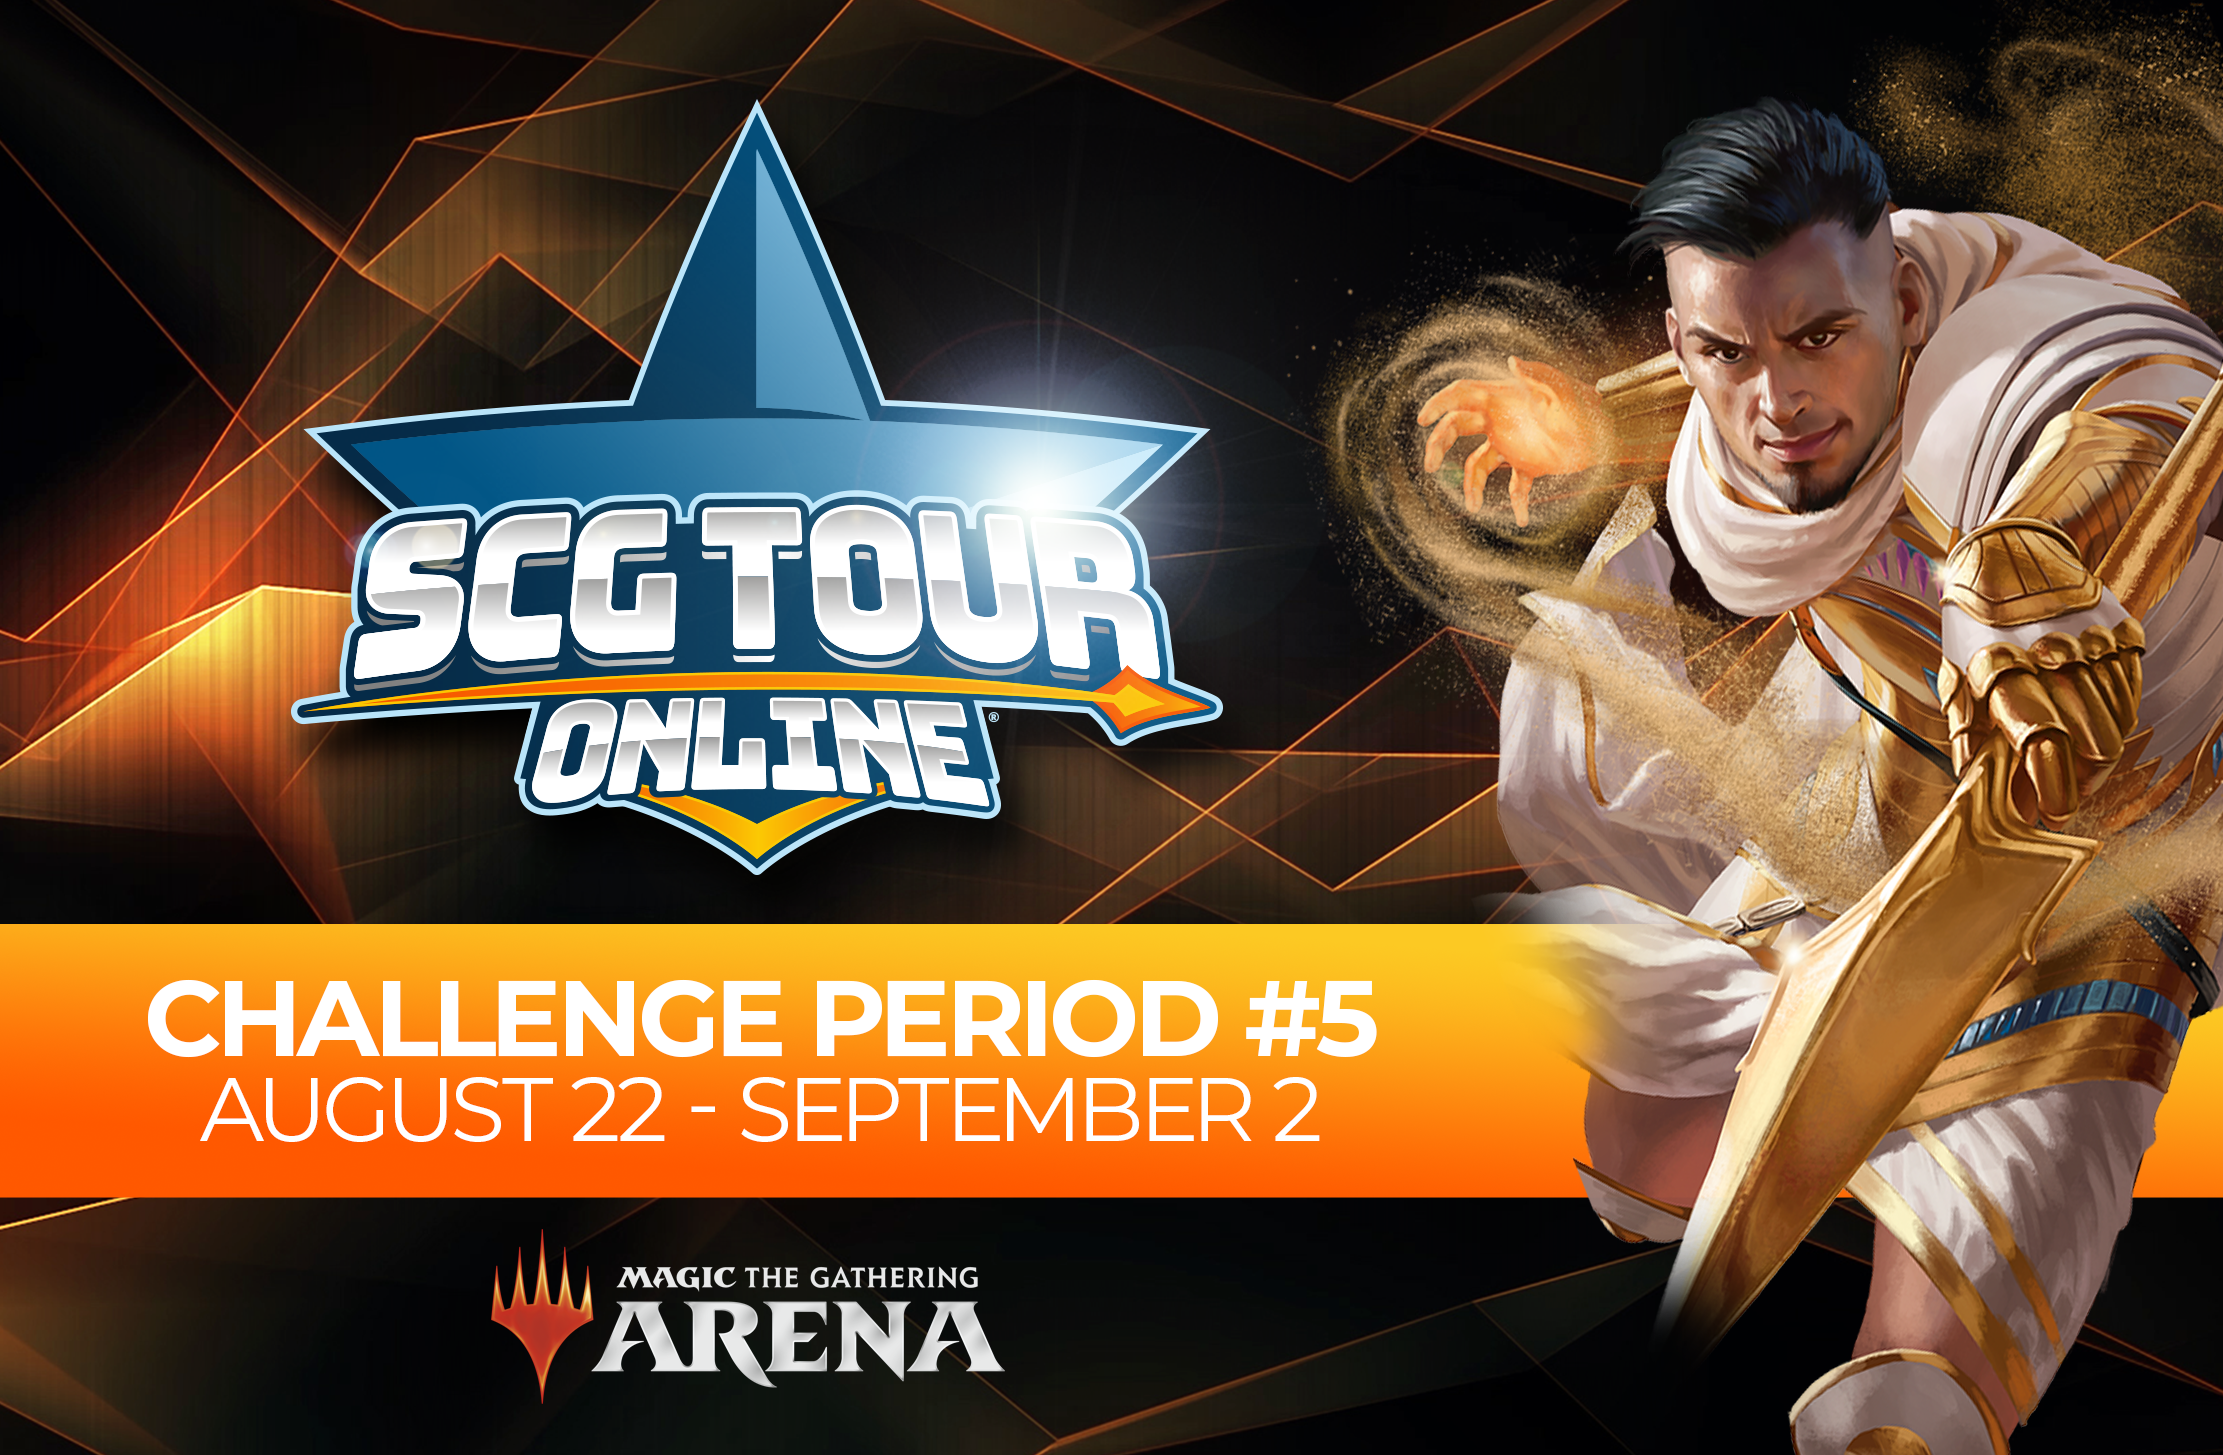 tournament brand image